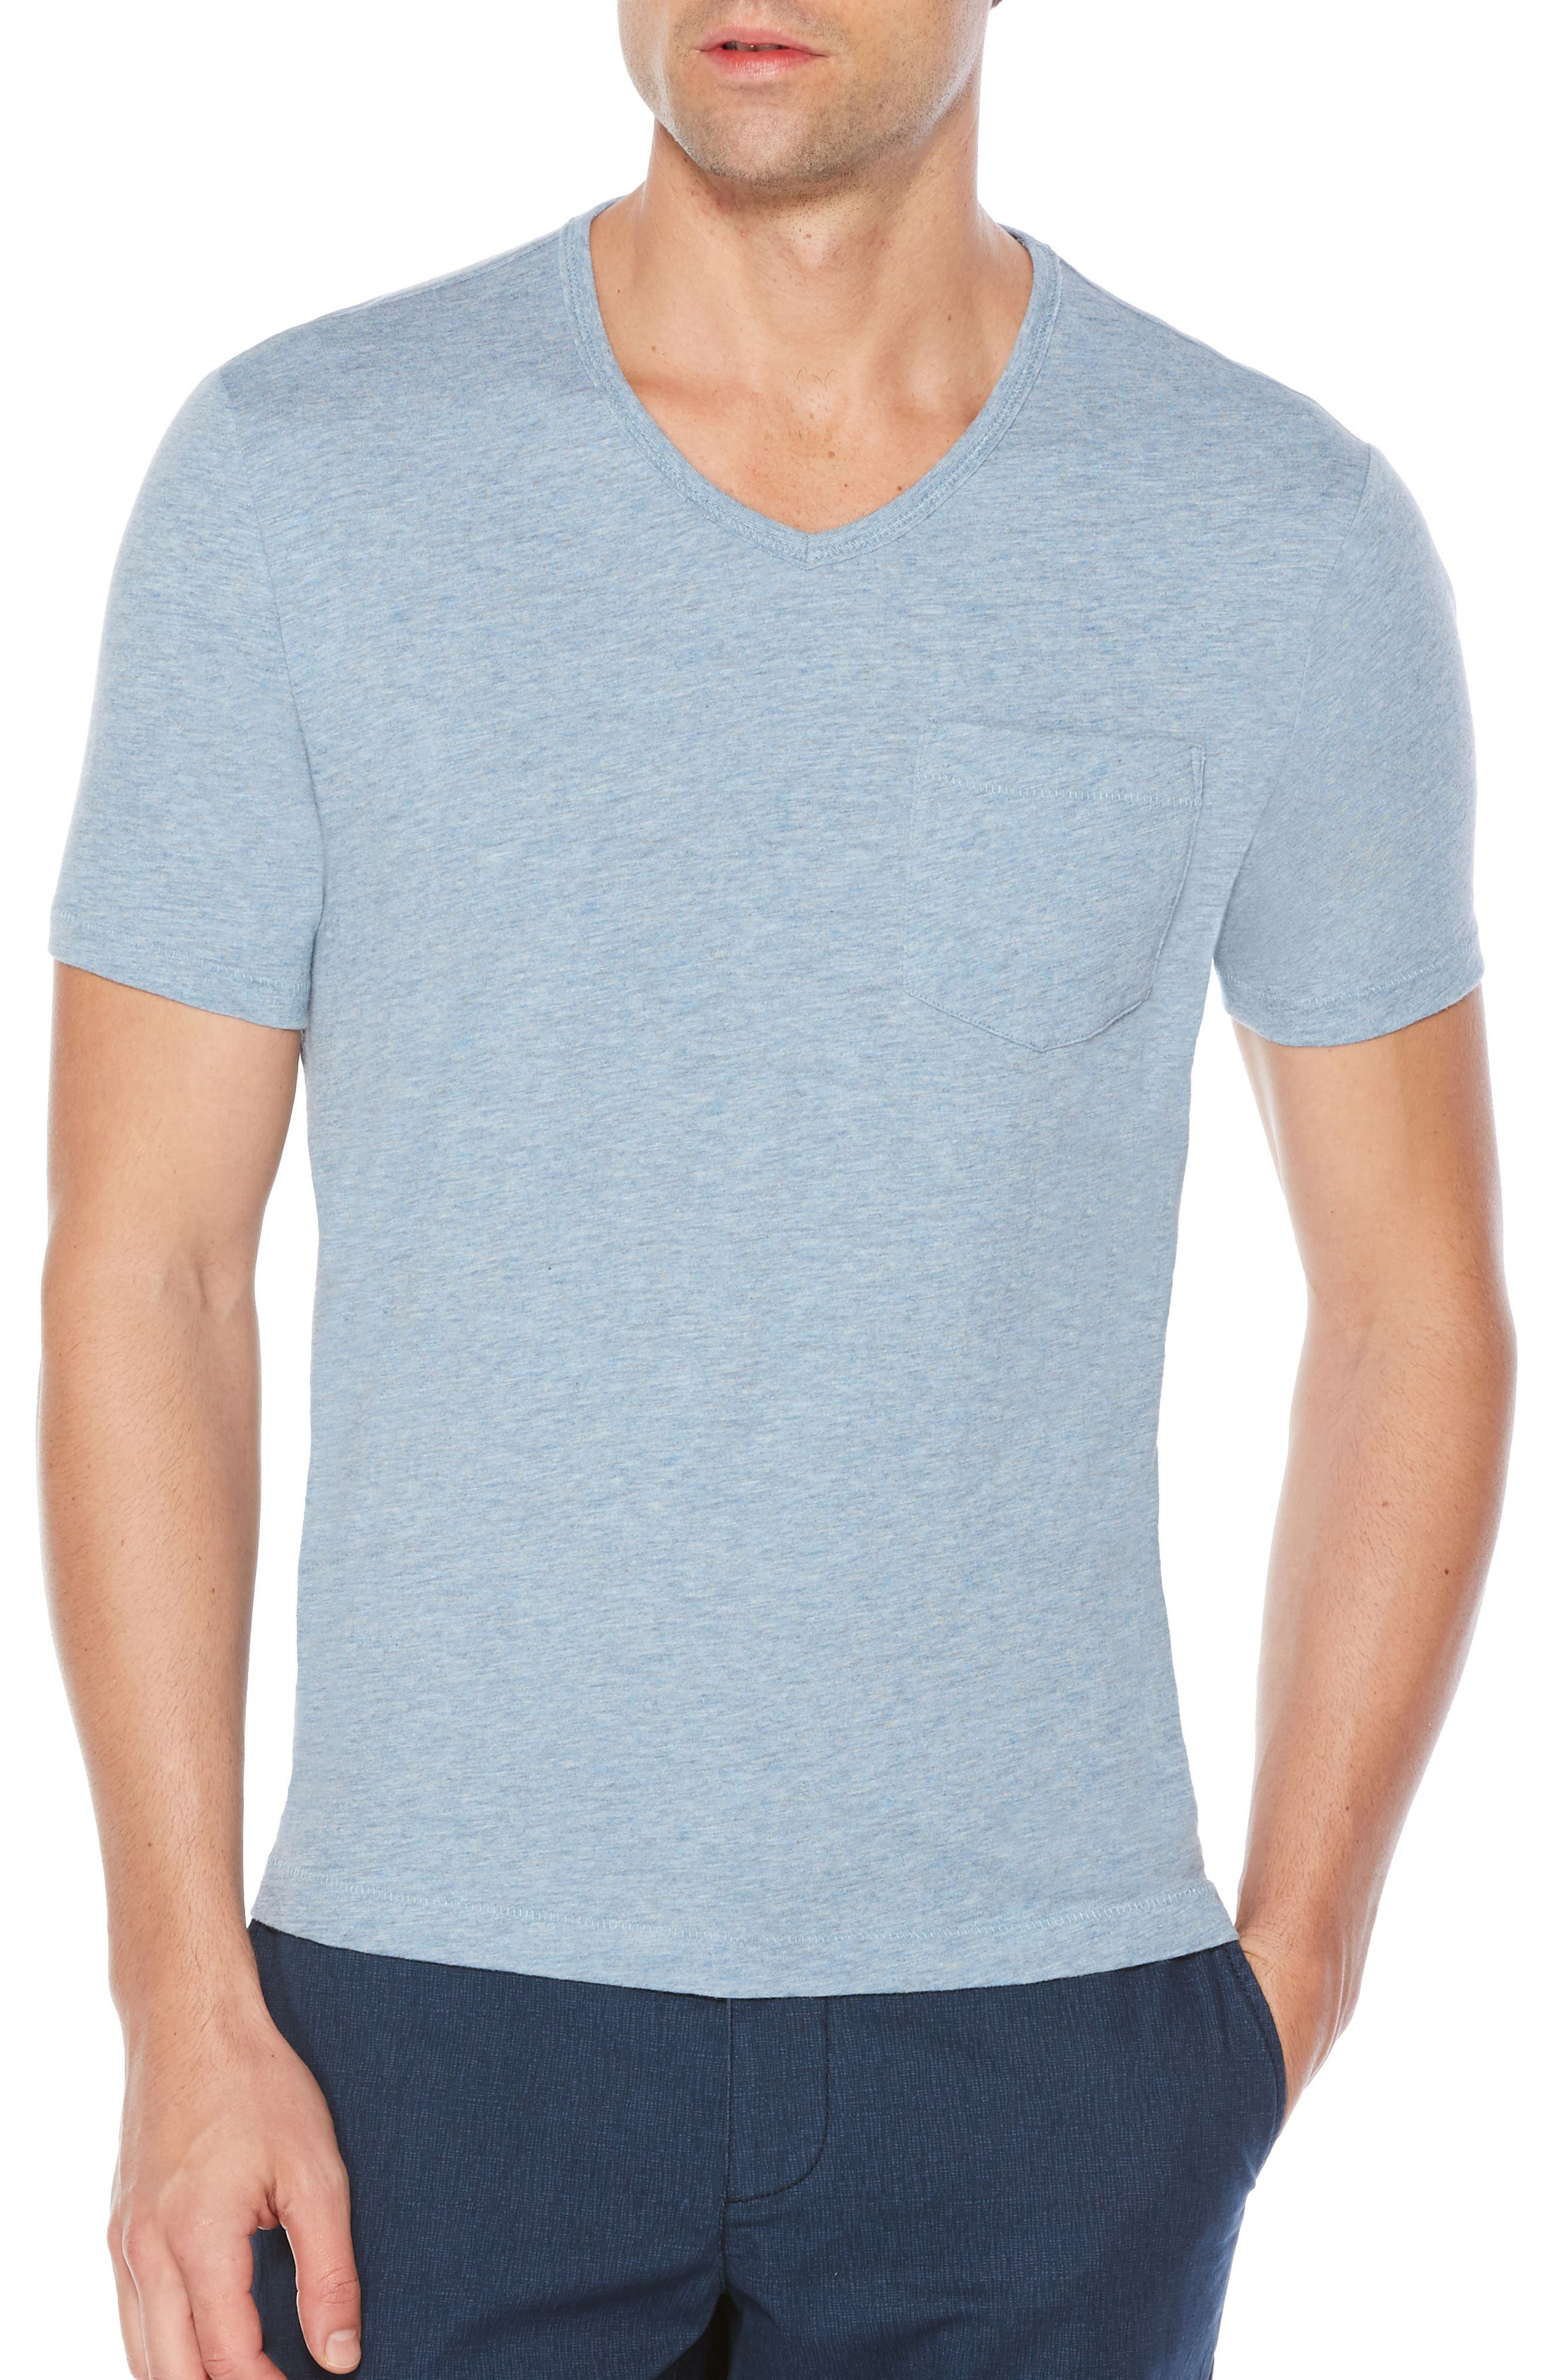 Alternate Image 1 Selected - Original Penguin Bing V-Neck T-Shirt